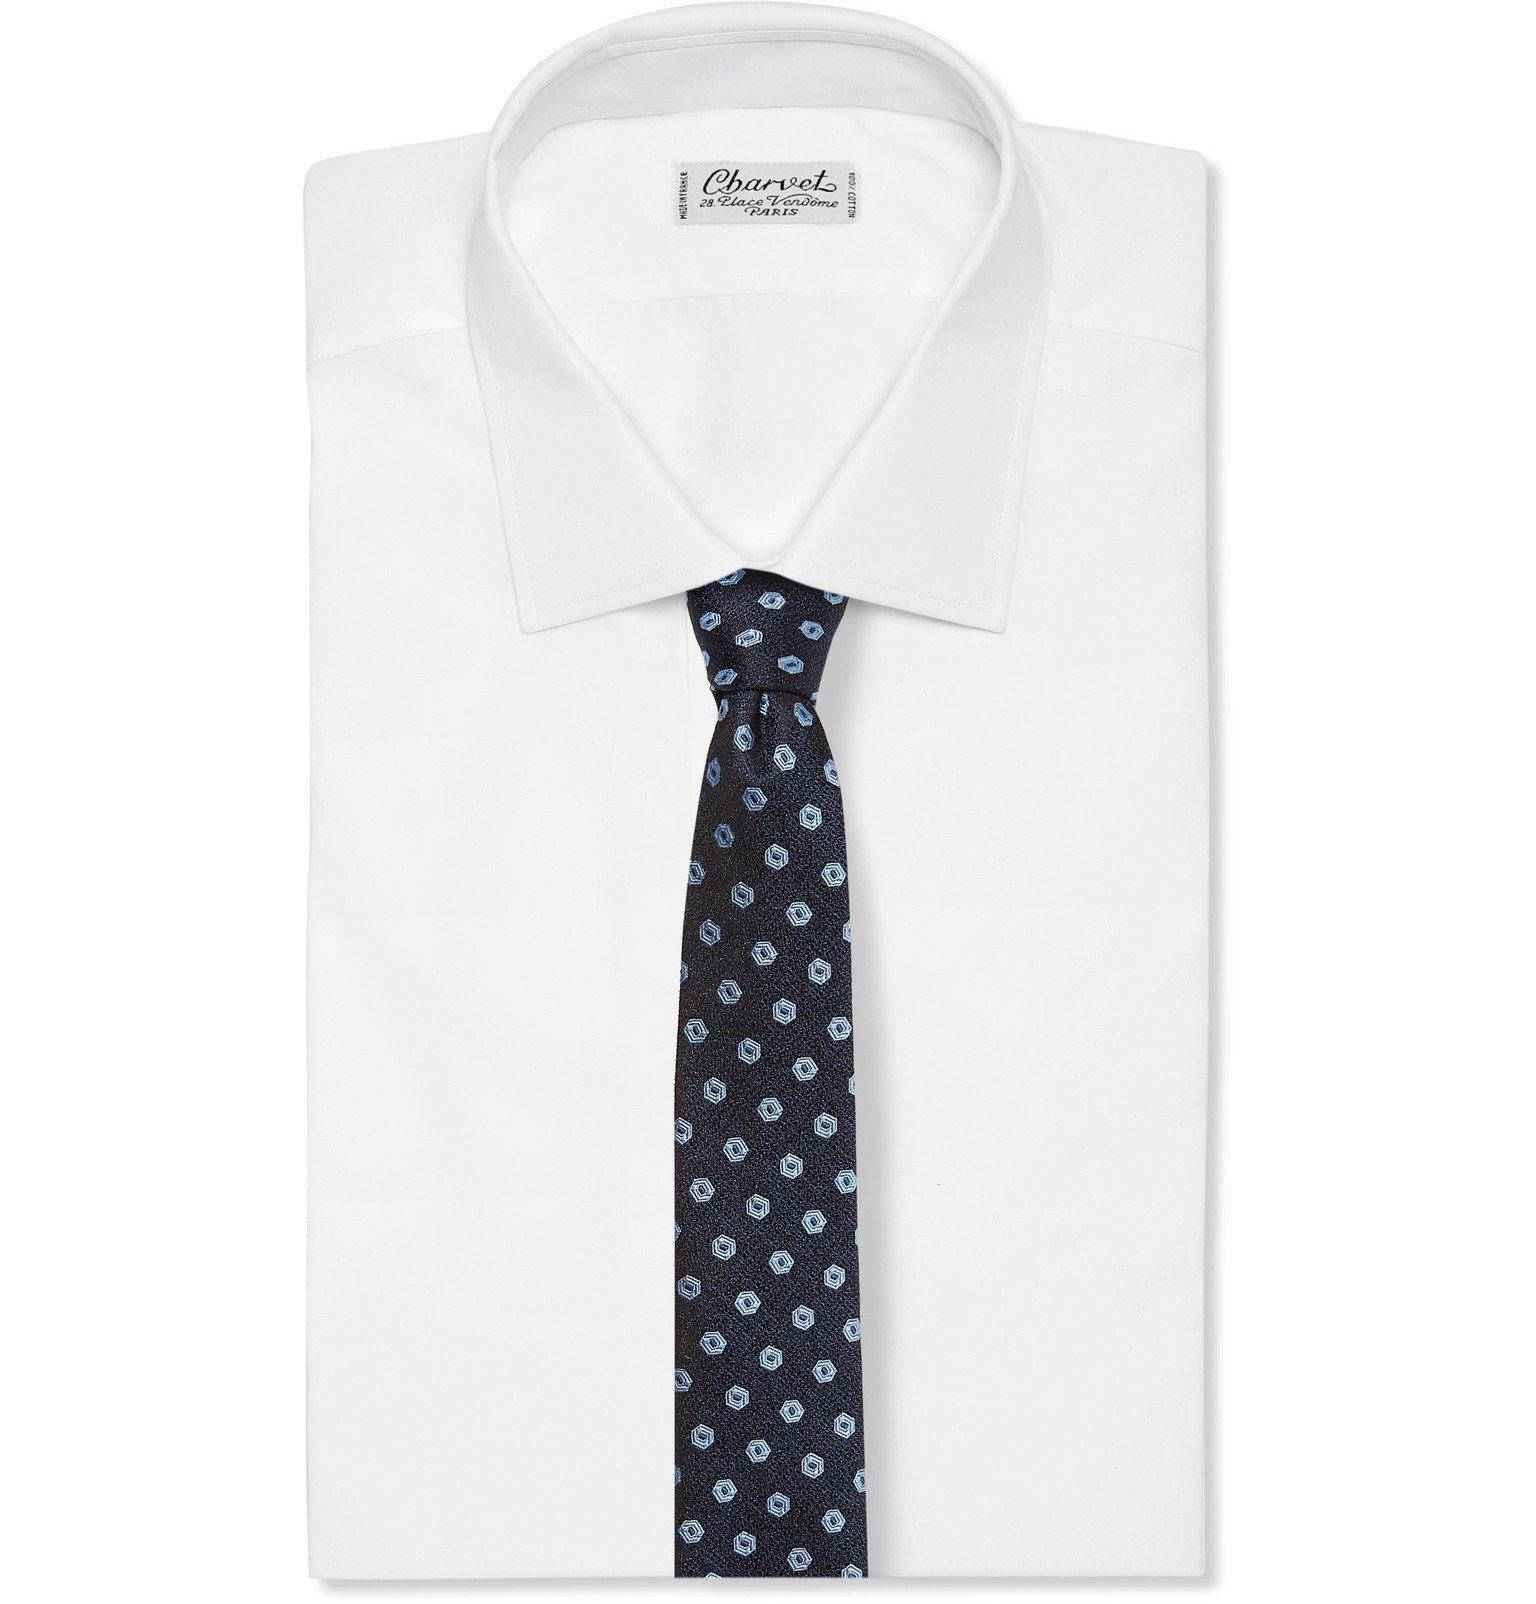 Dolce & Gabbana - 7cm Embroidered Silk-Jacquard Tie - Blue